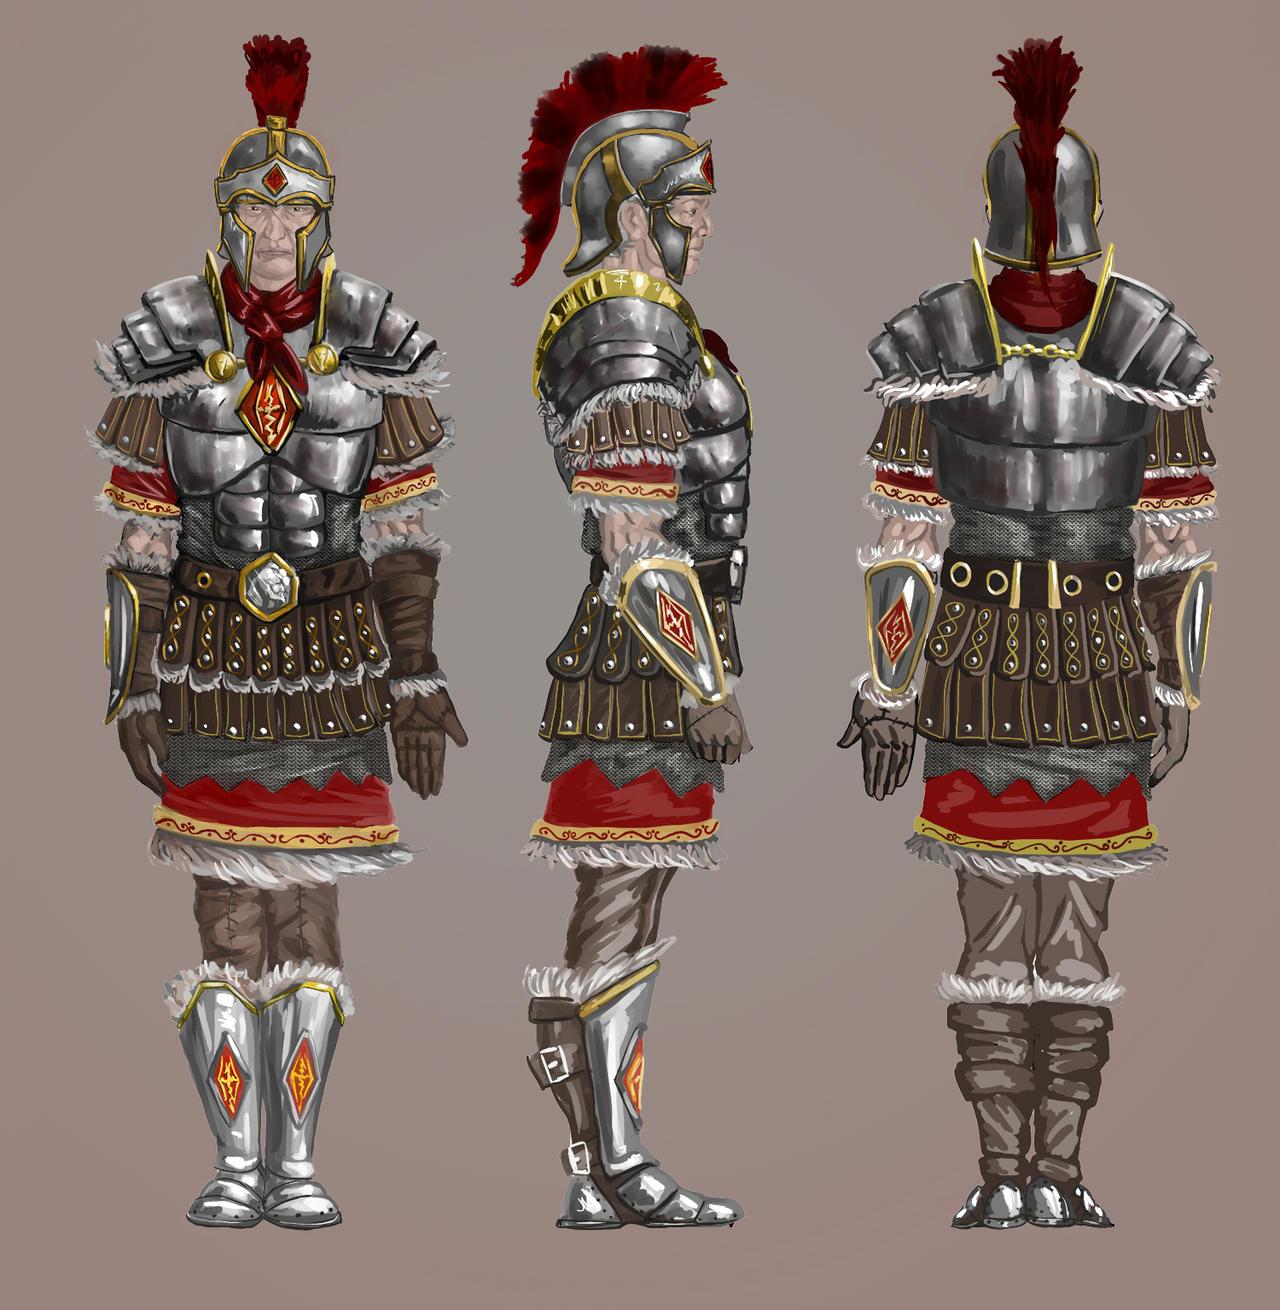 Legat of Skyrim legion by R-3h on DeviantArt